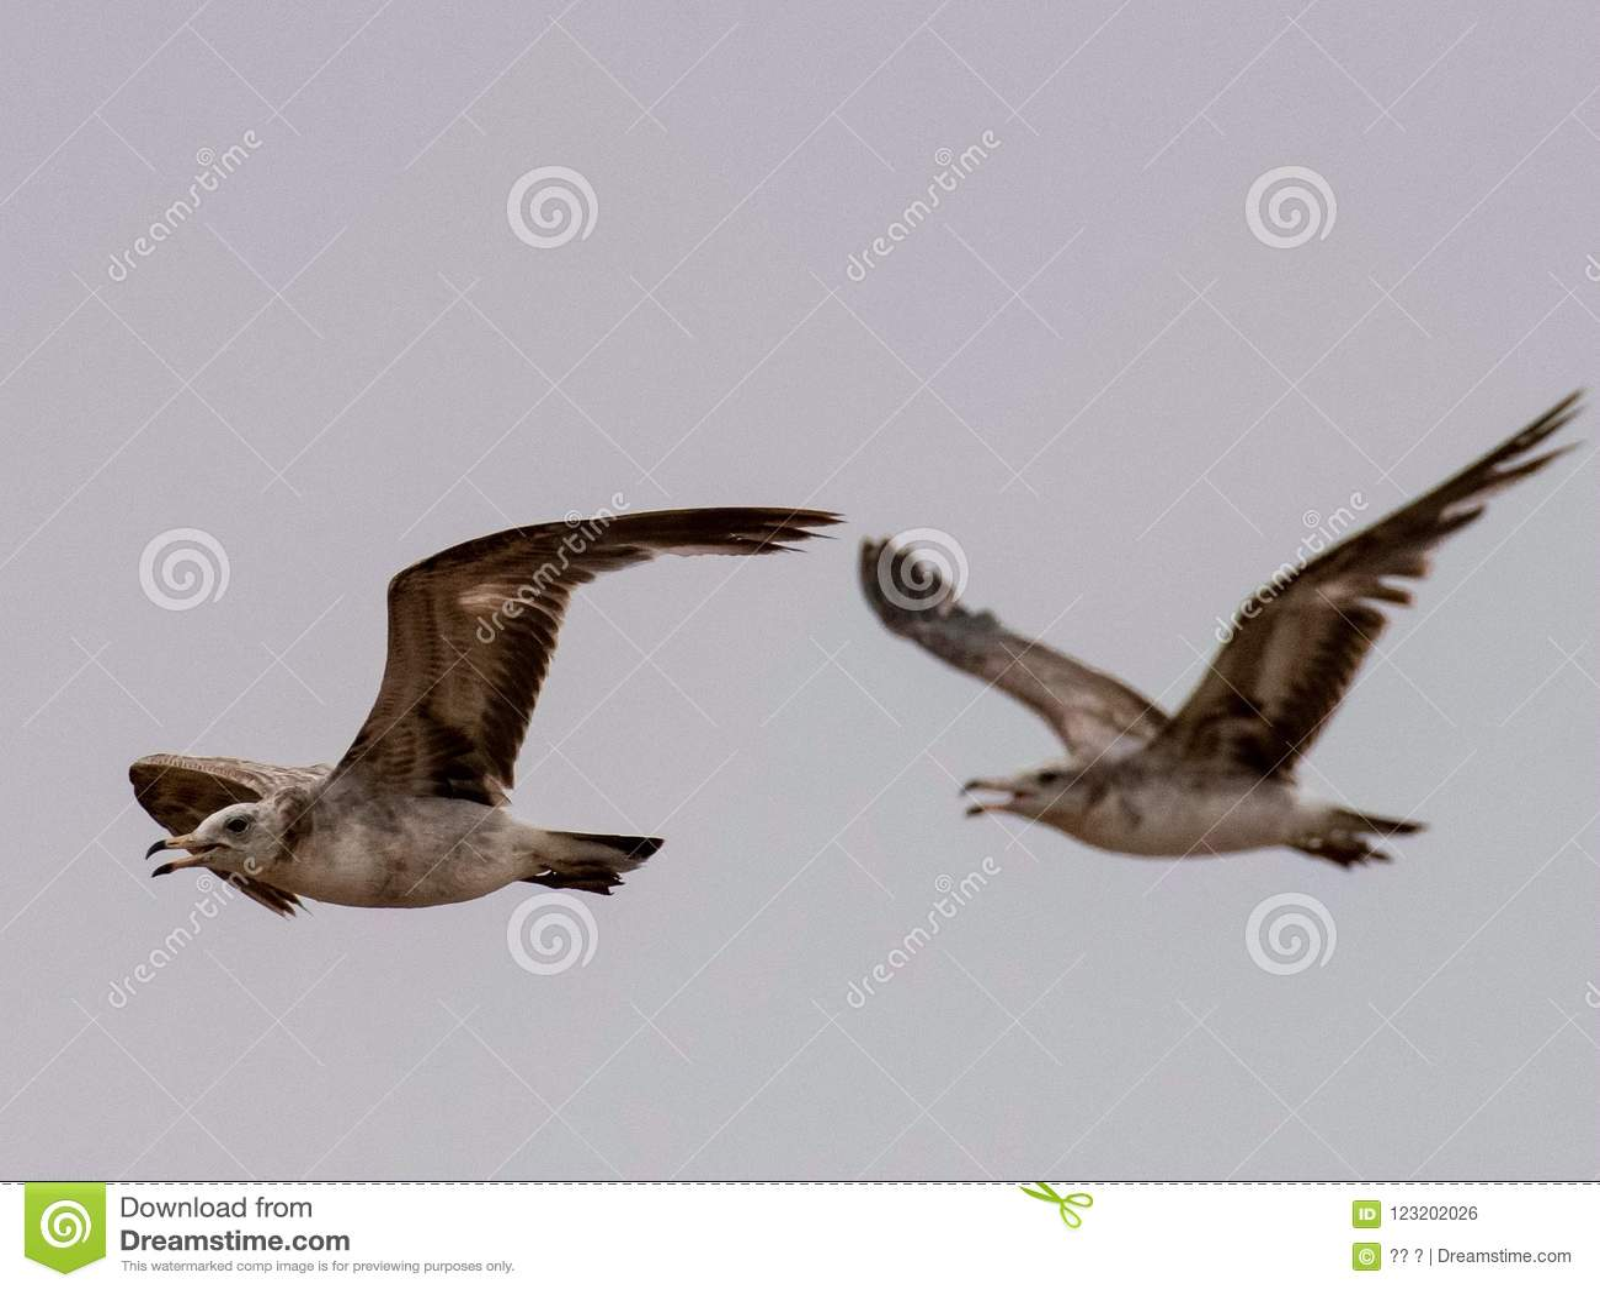 Seagulls And Petrel On The Edge Of Bohai Stock Photo - Image of